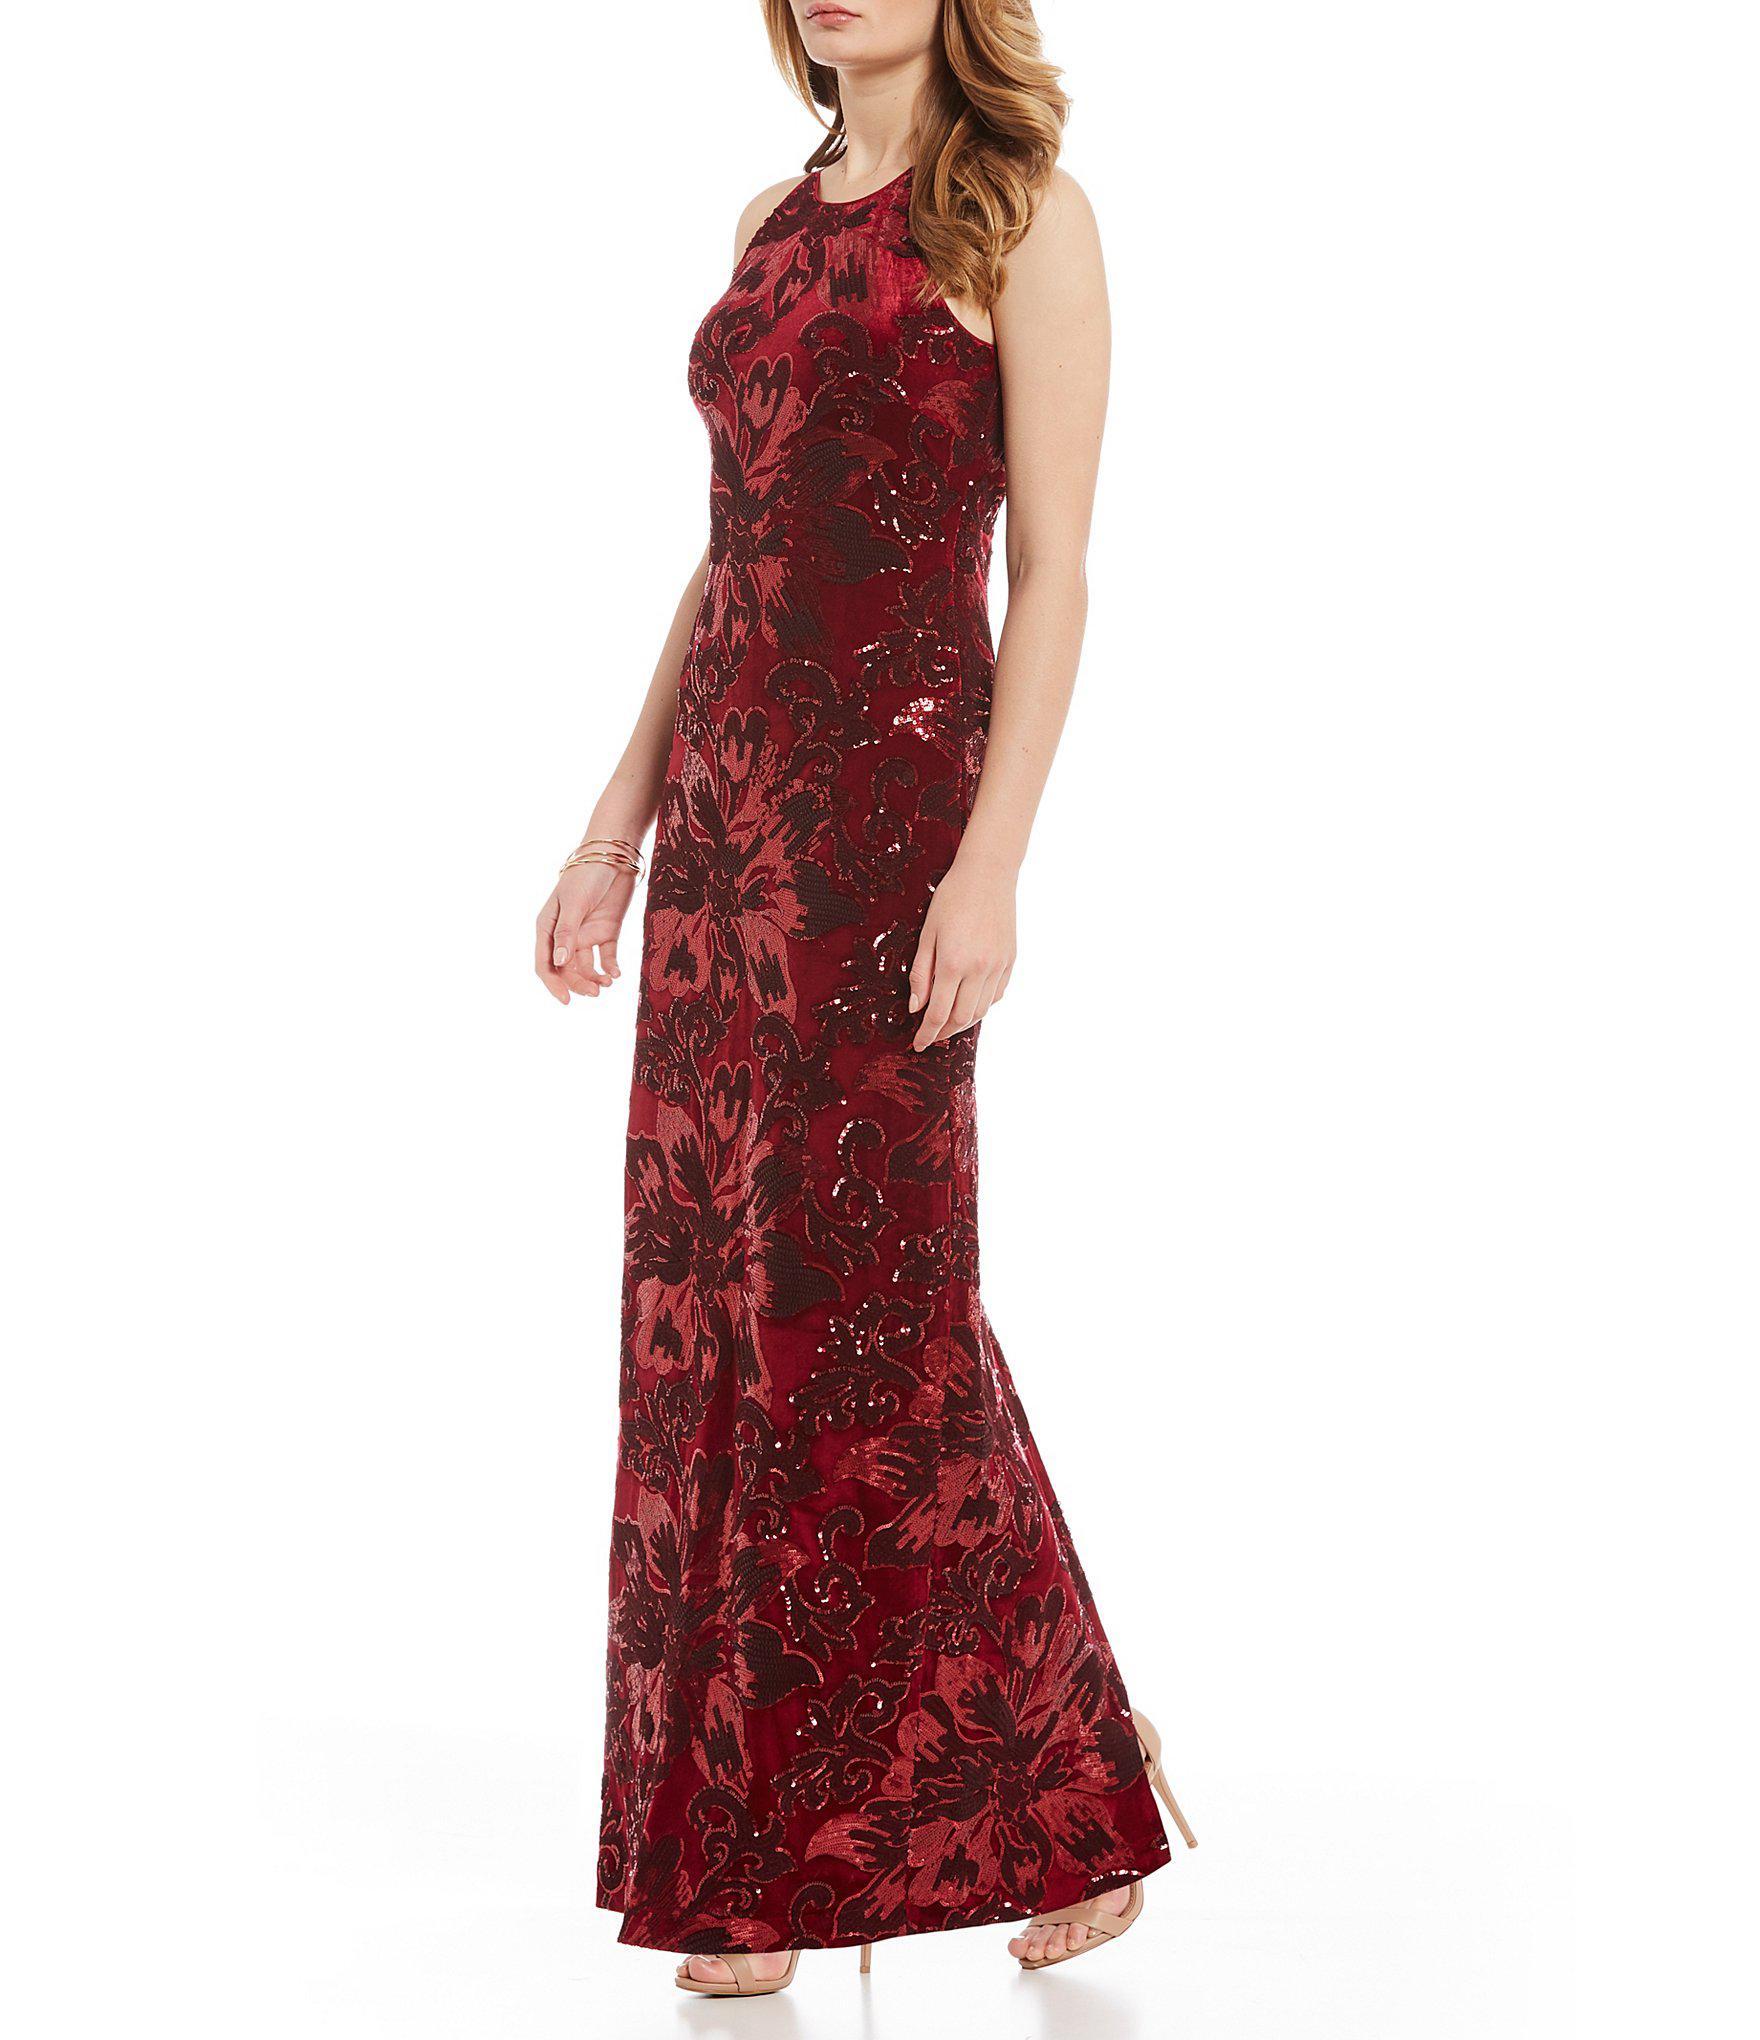 c5d2ef910ce Belle By Badgley Mischka Printed Velvet Sequin Gown in Red - Lyst